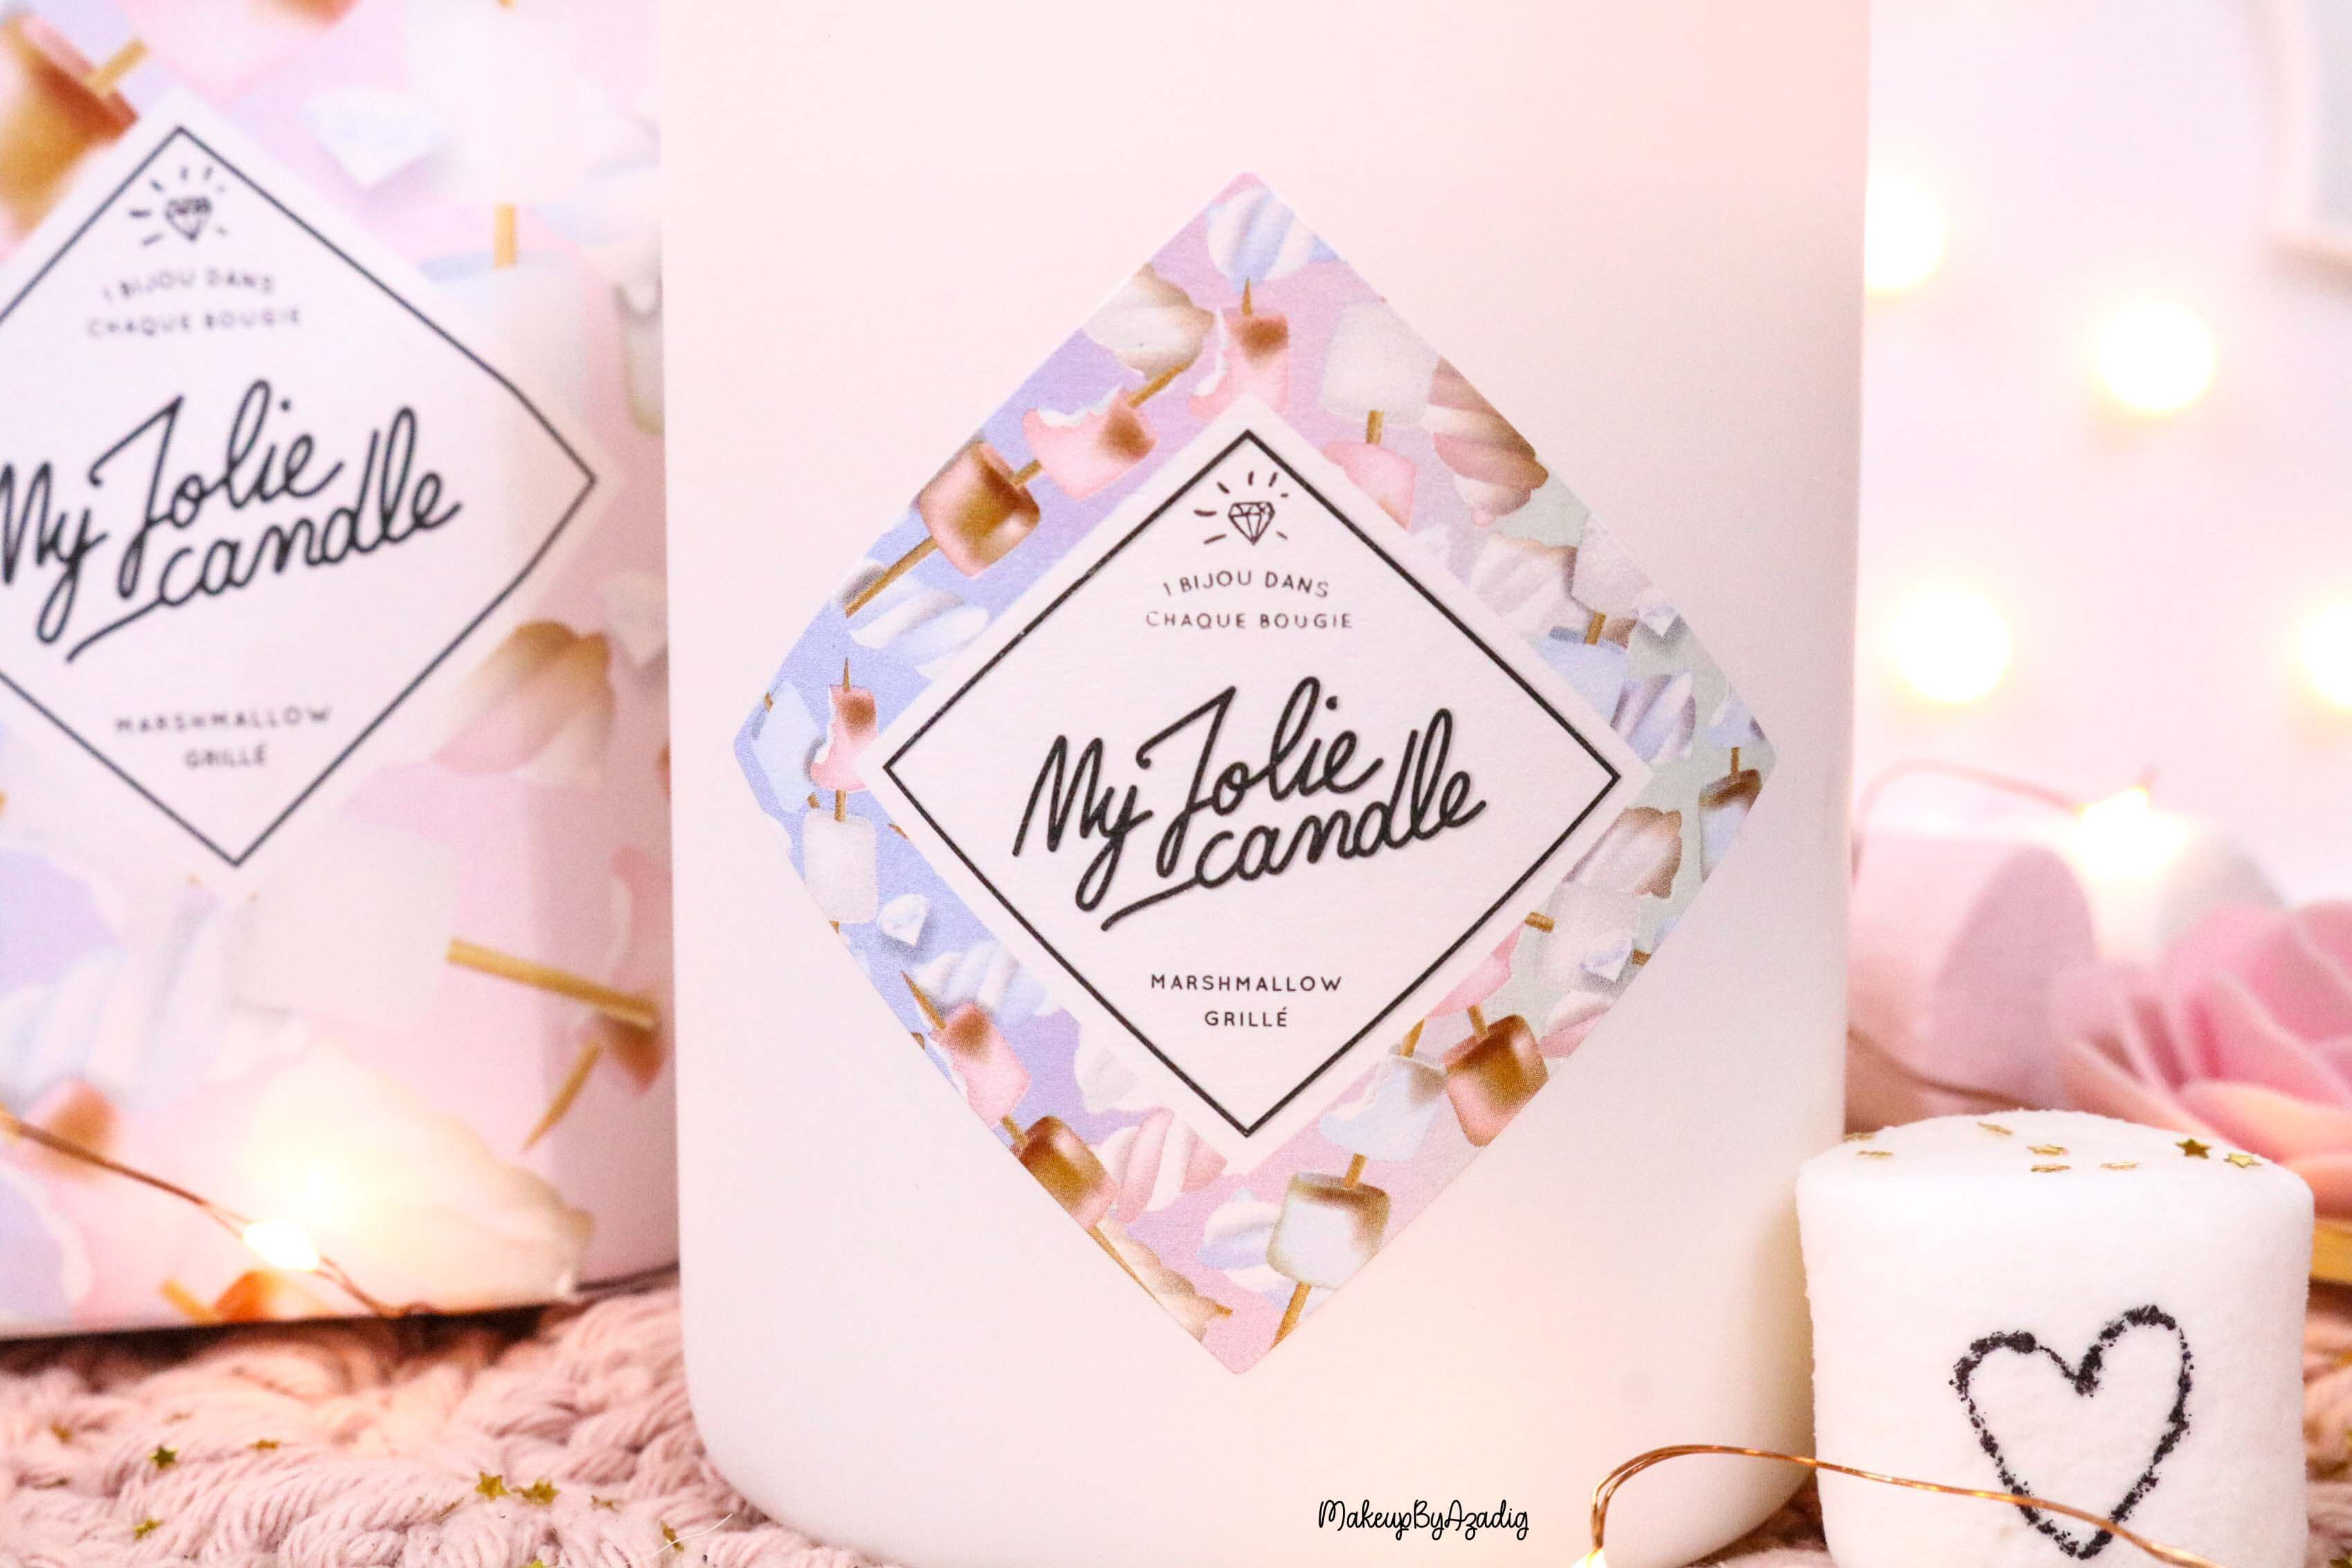 my-jolie-candle-bougie-bijou-swarovski-argent-cadeau-maman-mamie-femme-makeupbyazadig-collector-chamallow-avis-prix-logo